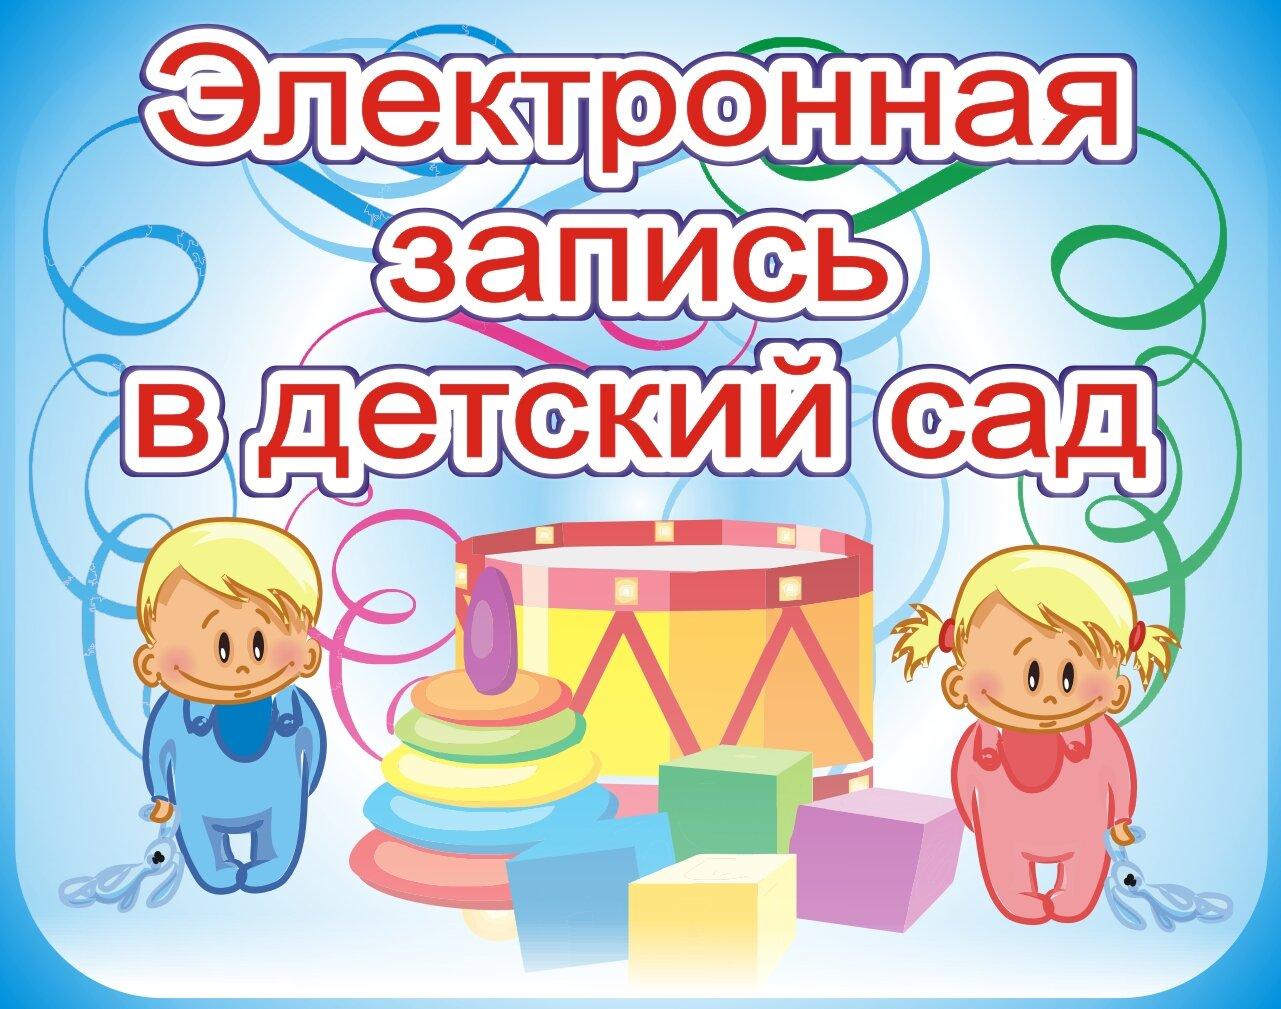 detskij_sad_ehlektronnaja_zapis_baner